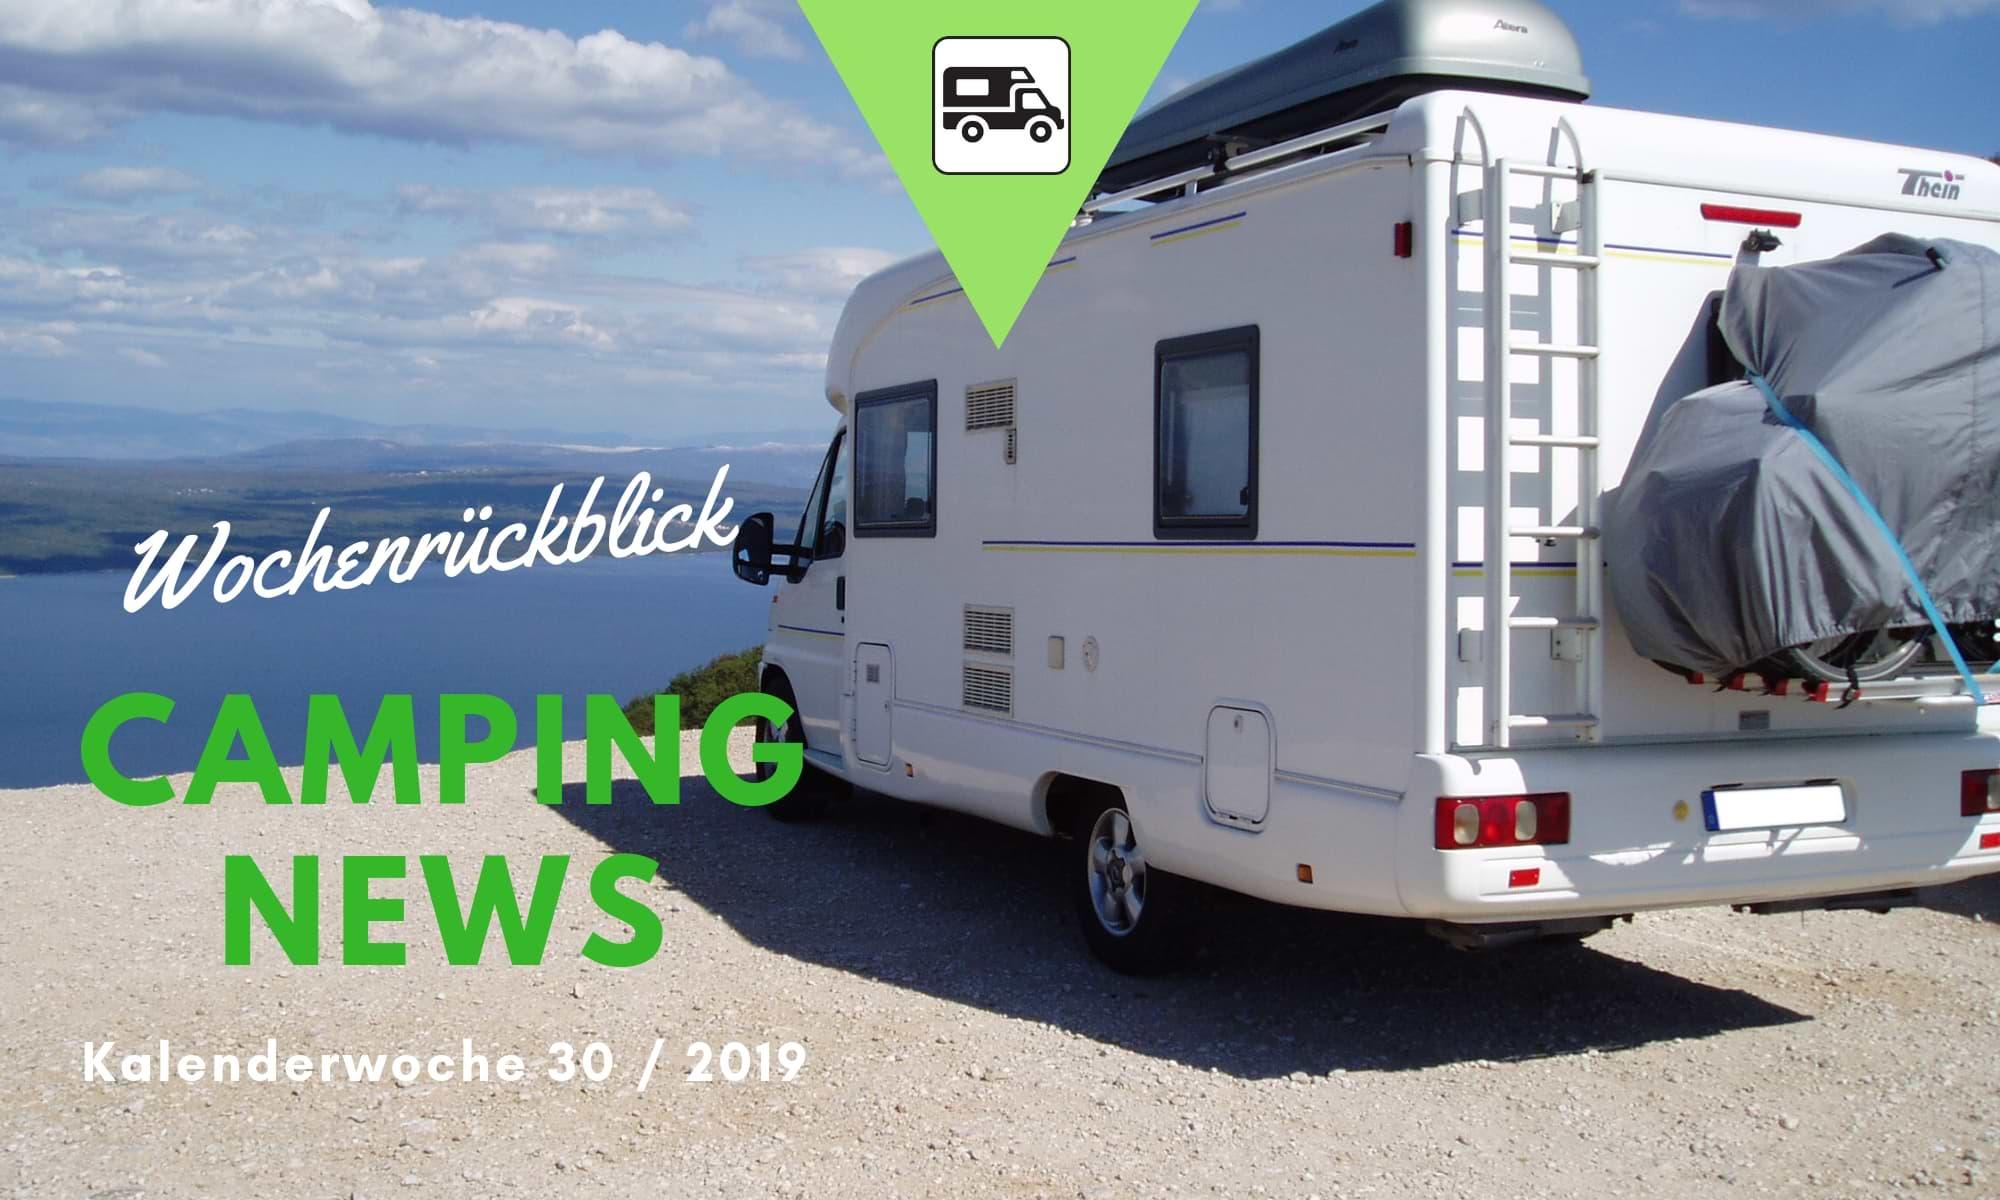 Wochenrückblick Camping News KW30-2019